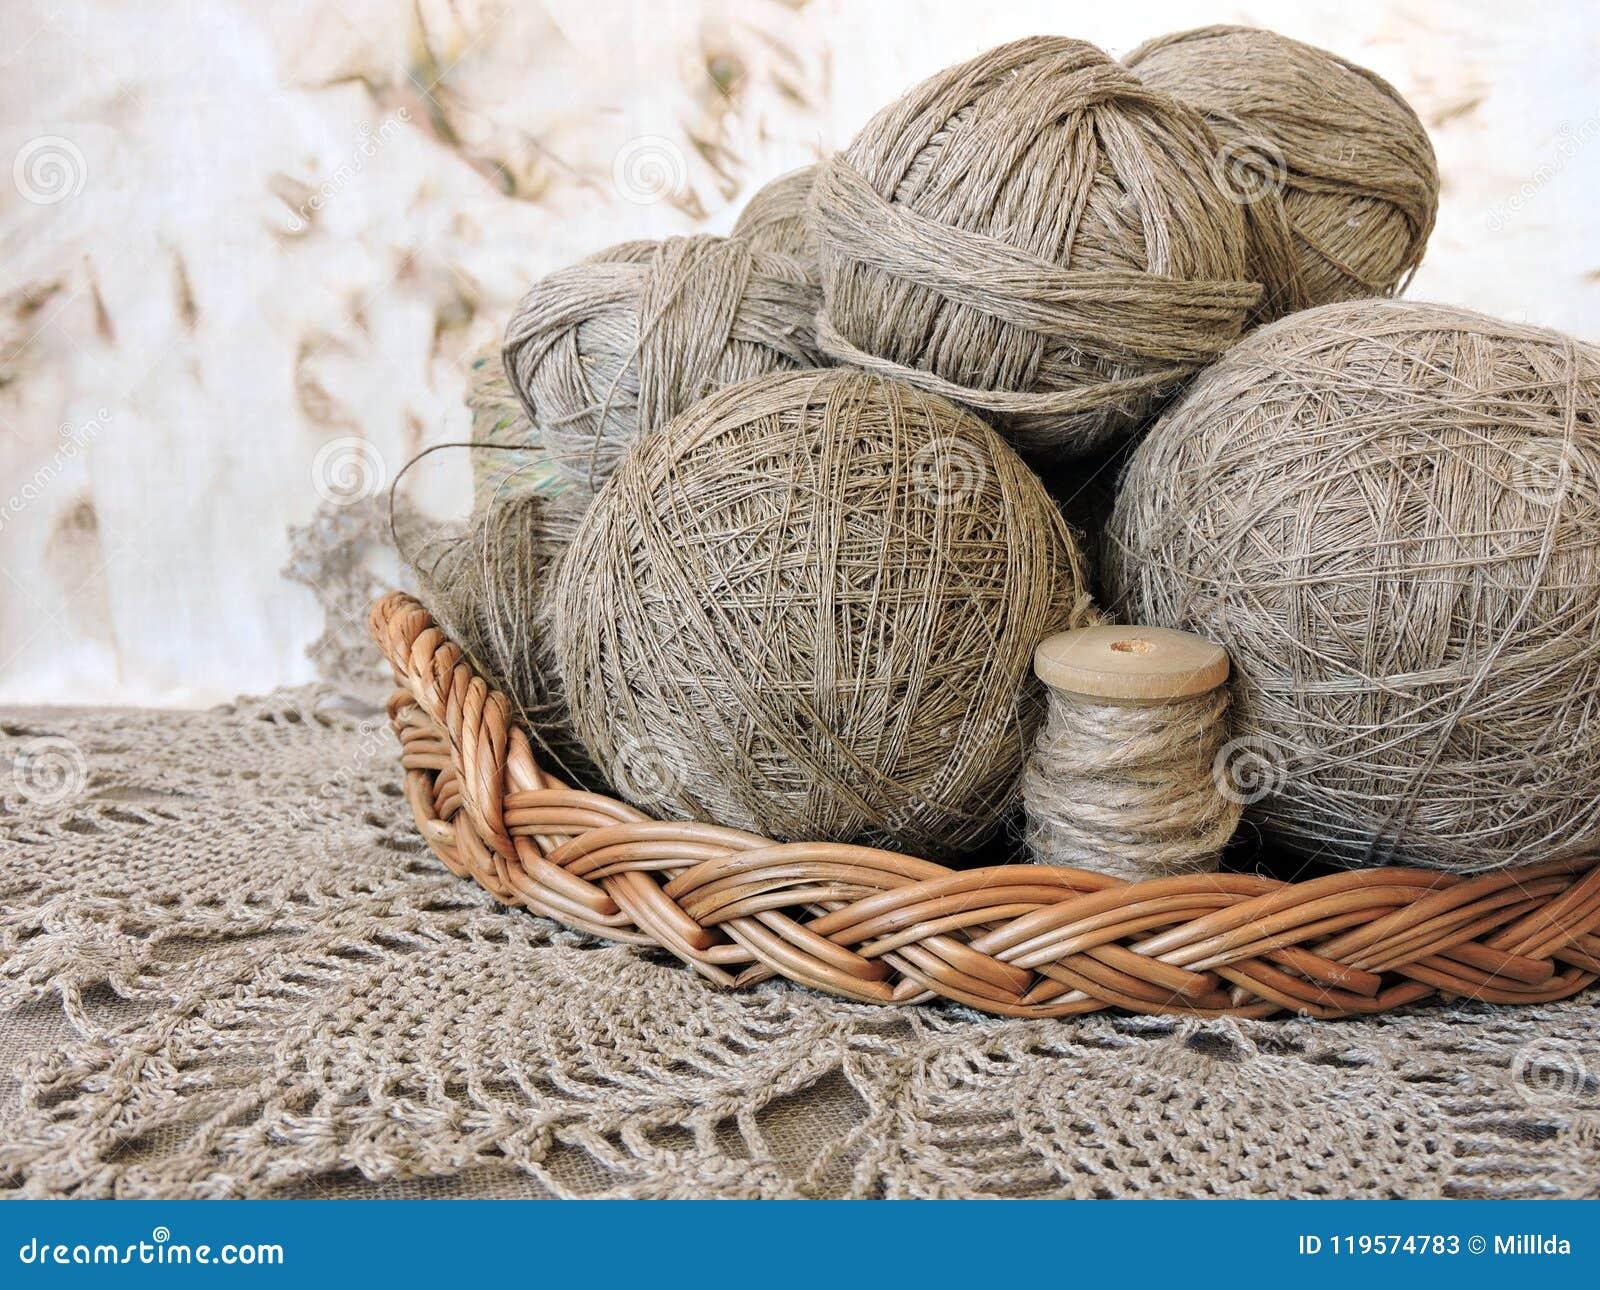 Lithuanian Linen Yarn